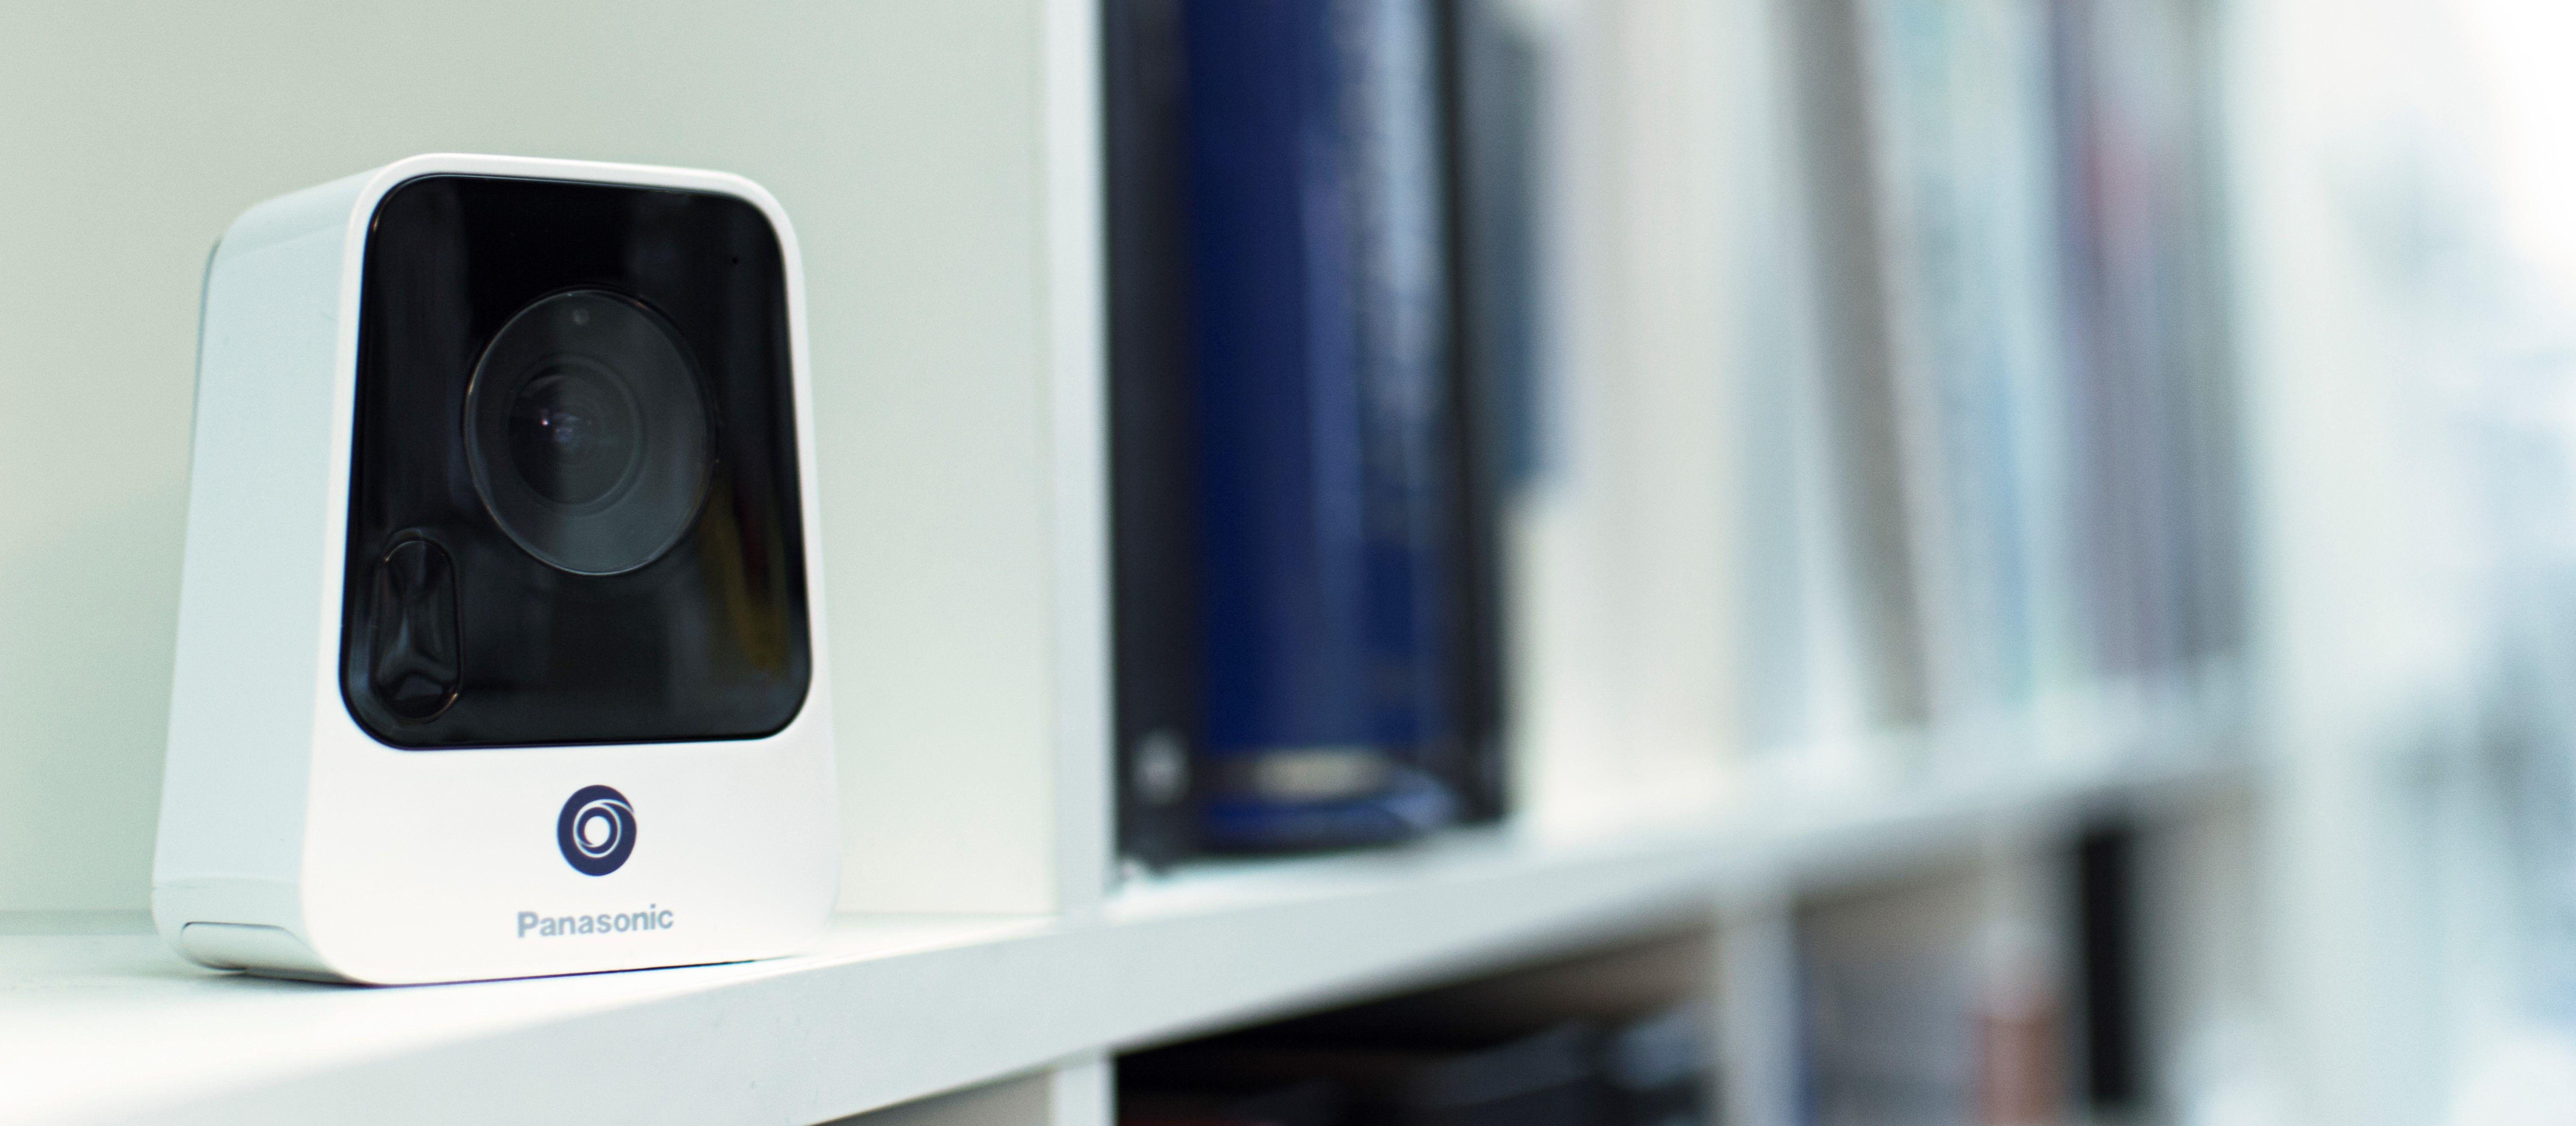 Panasonic nubo 4g security camera slimdesign smart product bookshelf smart product